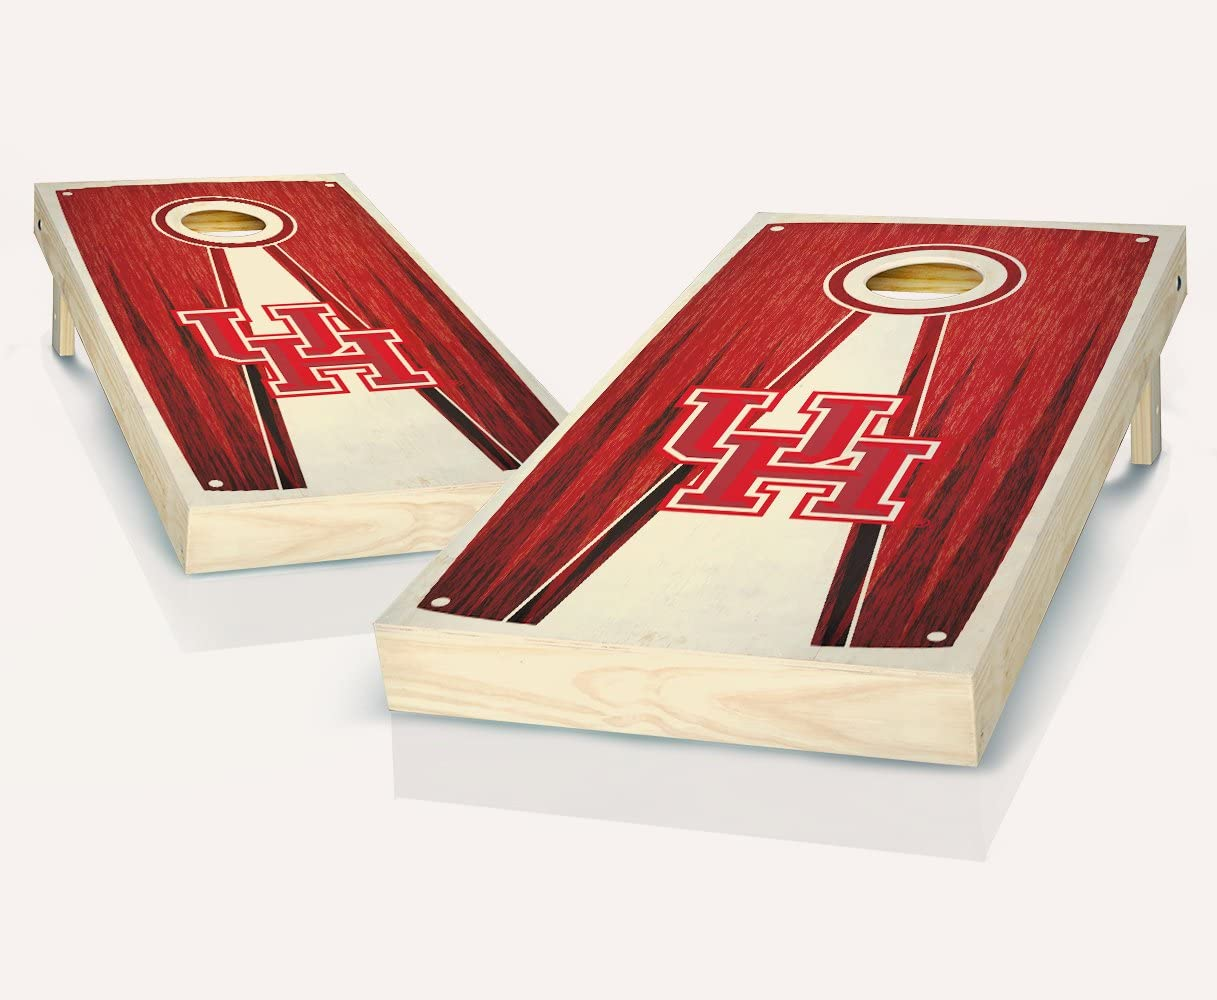 Wedding cornhole boards Baggo Slick Woodys Houston Basketball Cornhole set Bean bag toss Custom Cornhole boards